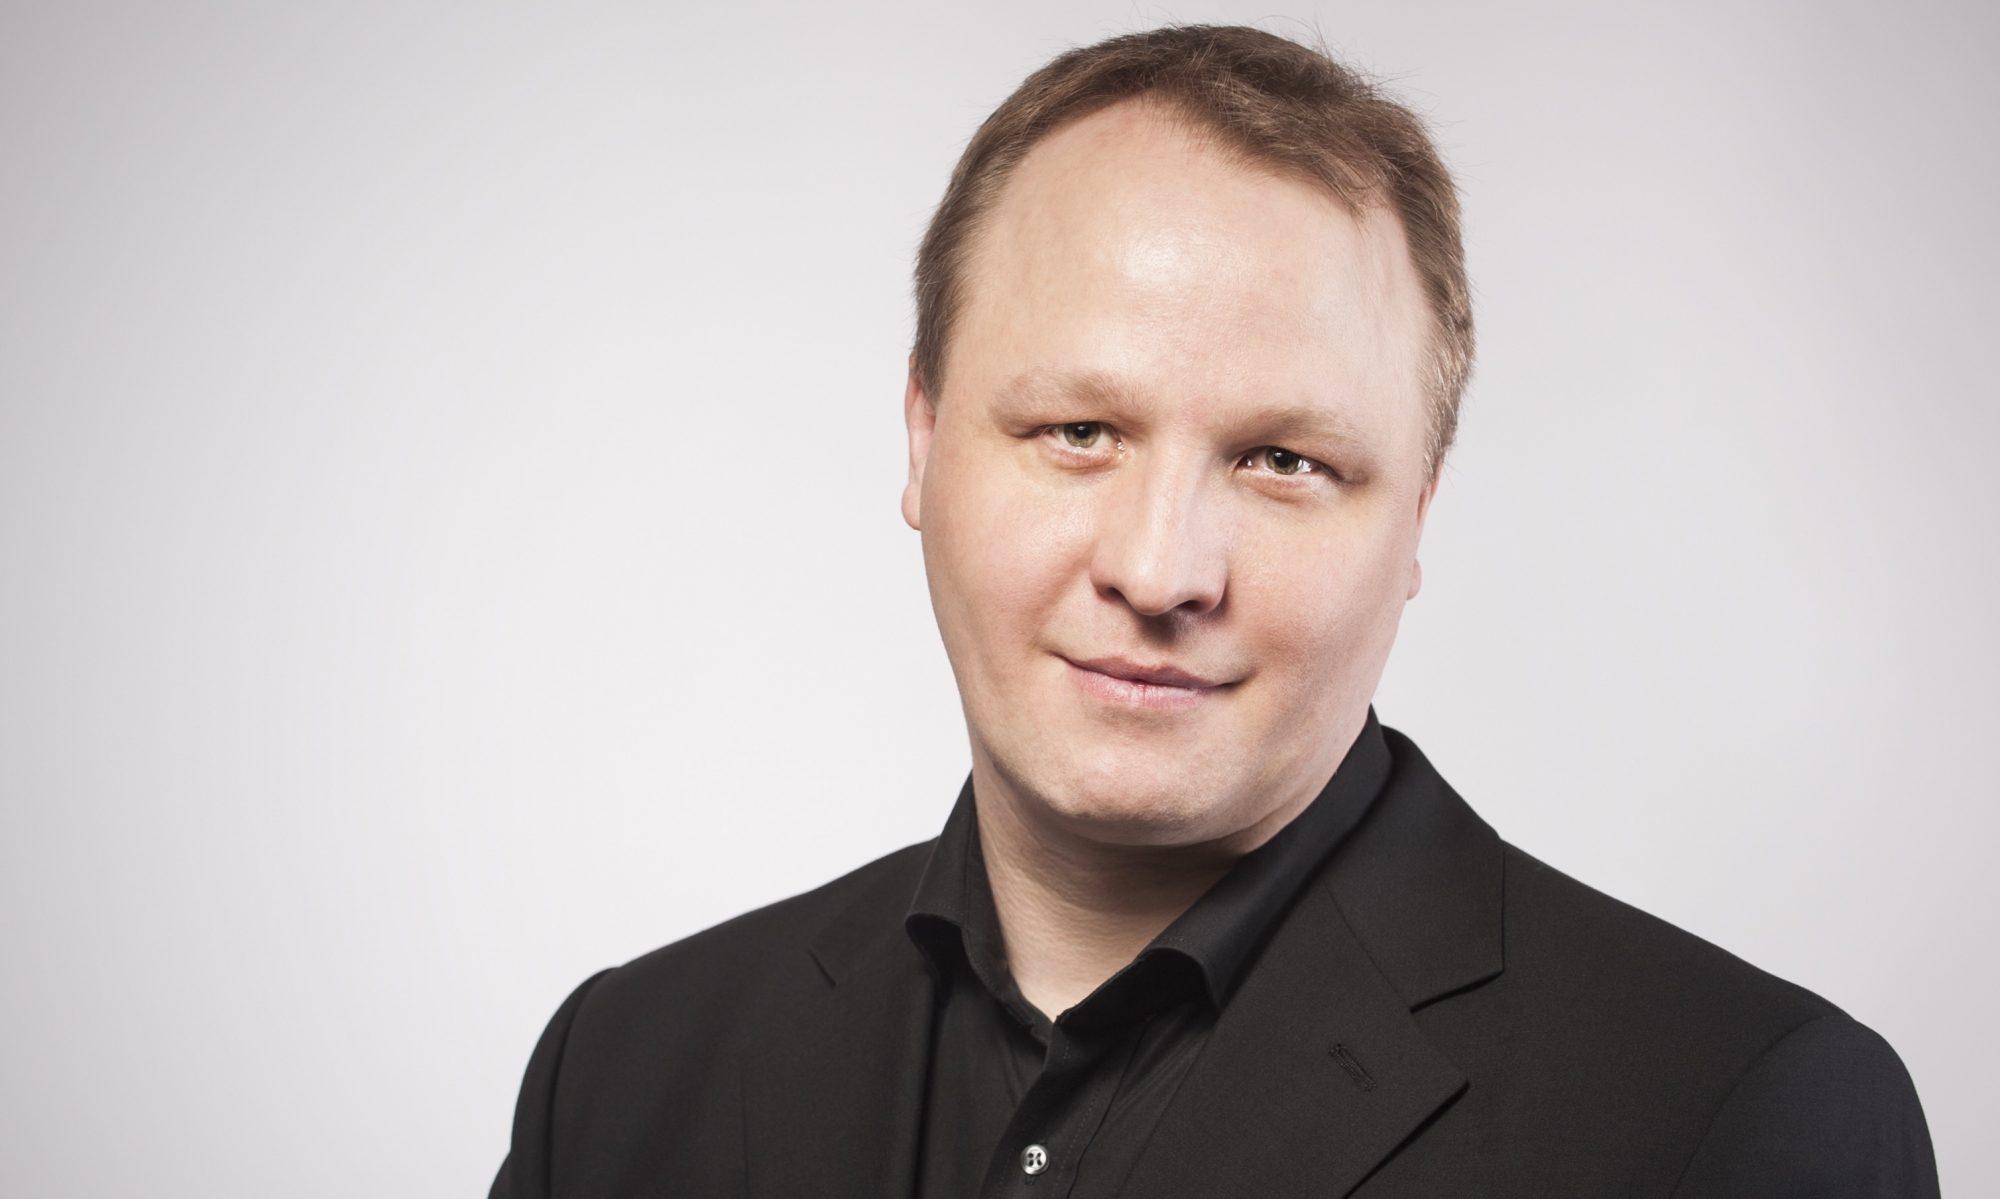 Florian Gründel